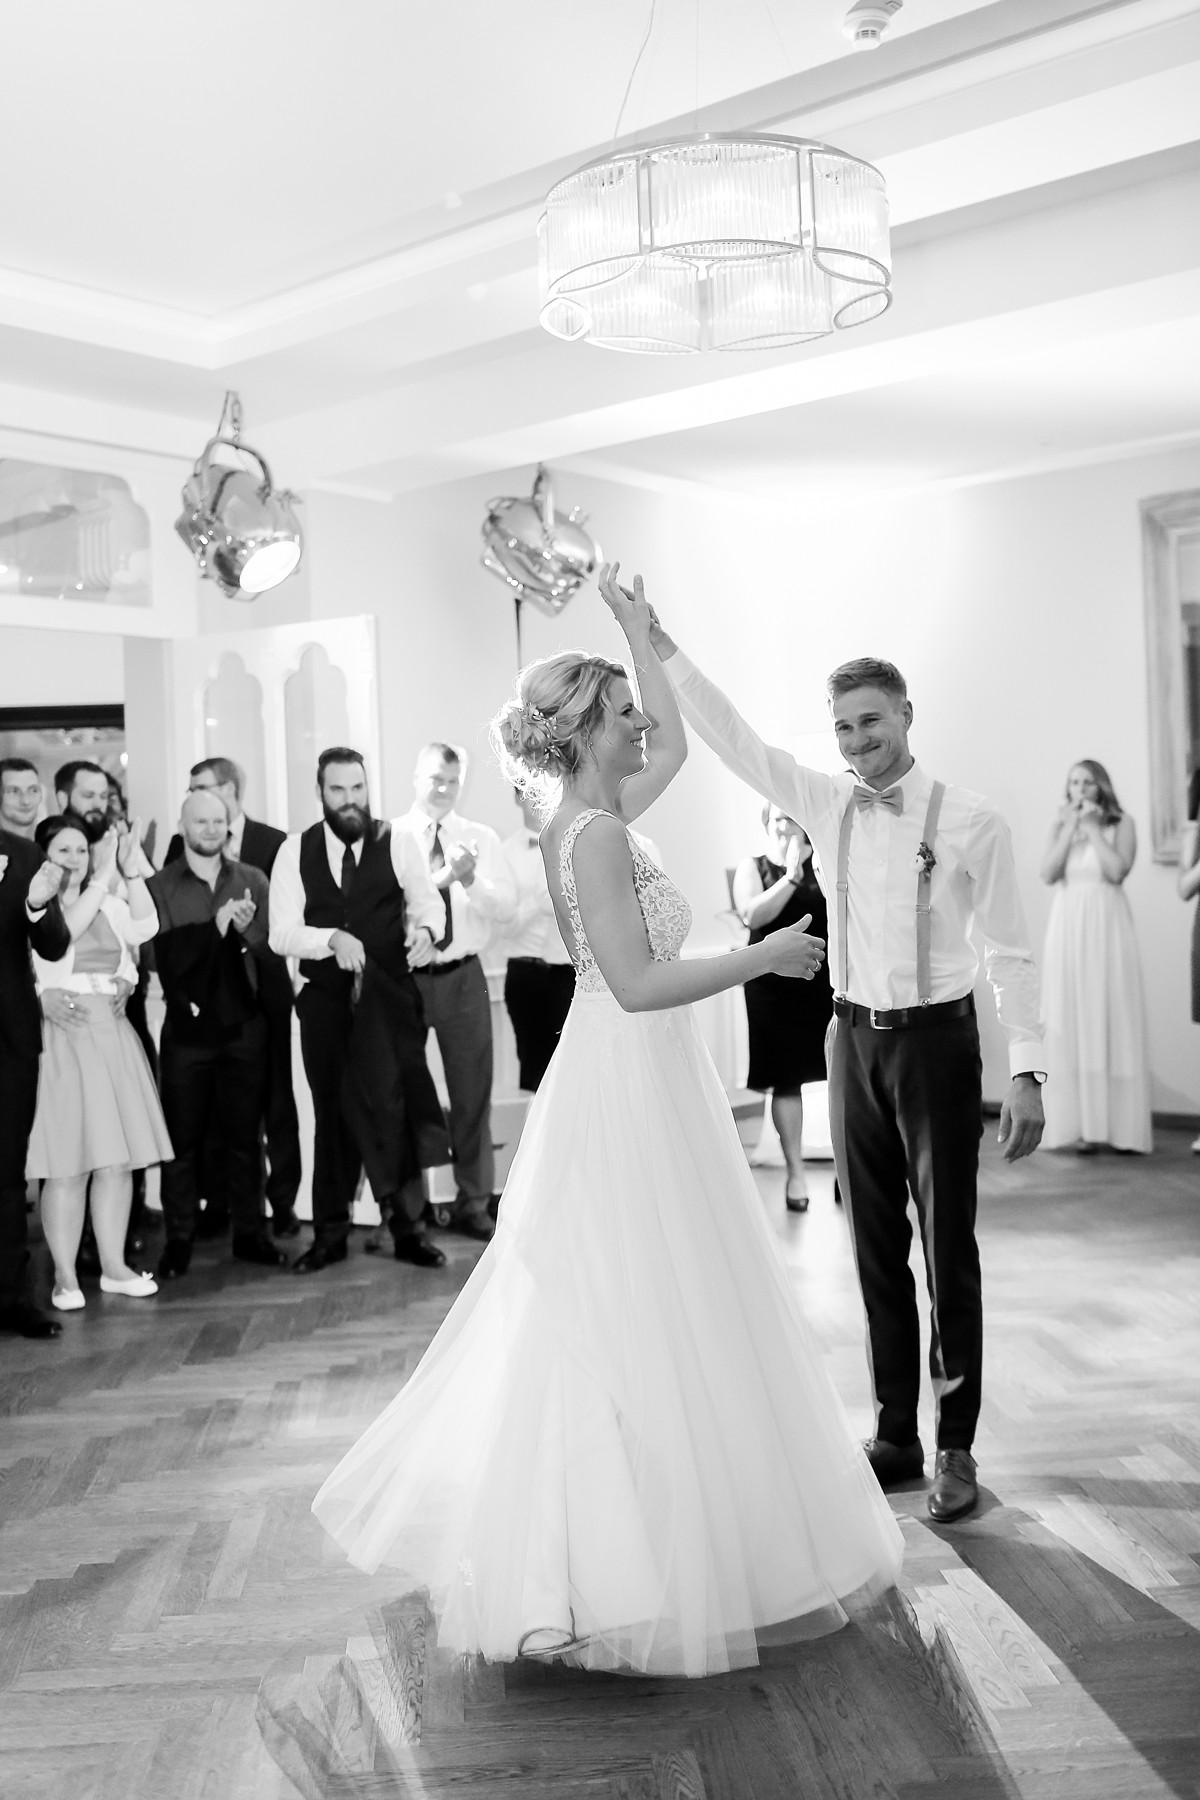 Hochzeitsfotograf-Hildesheim-Hannover-Fotograf_0114